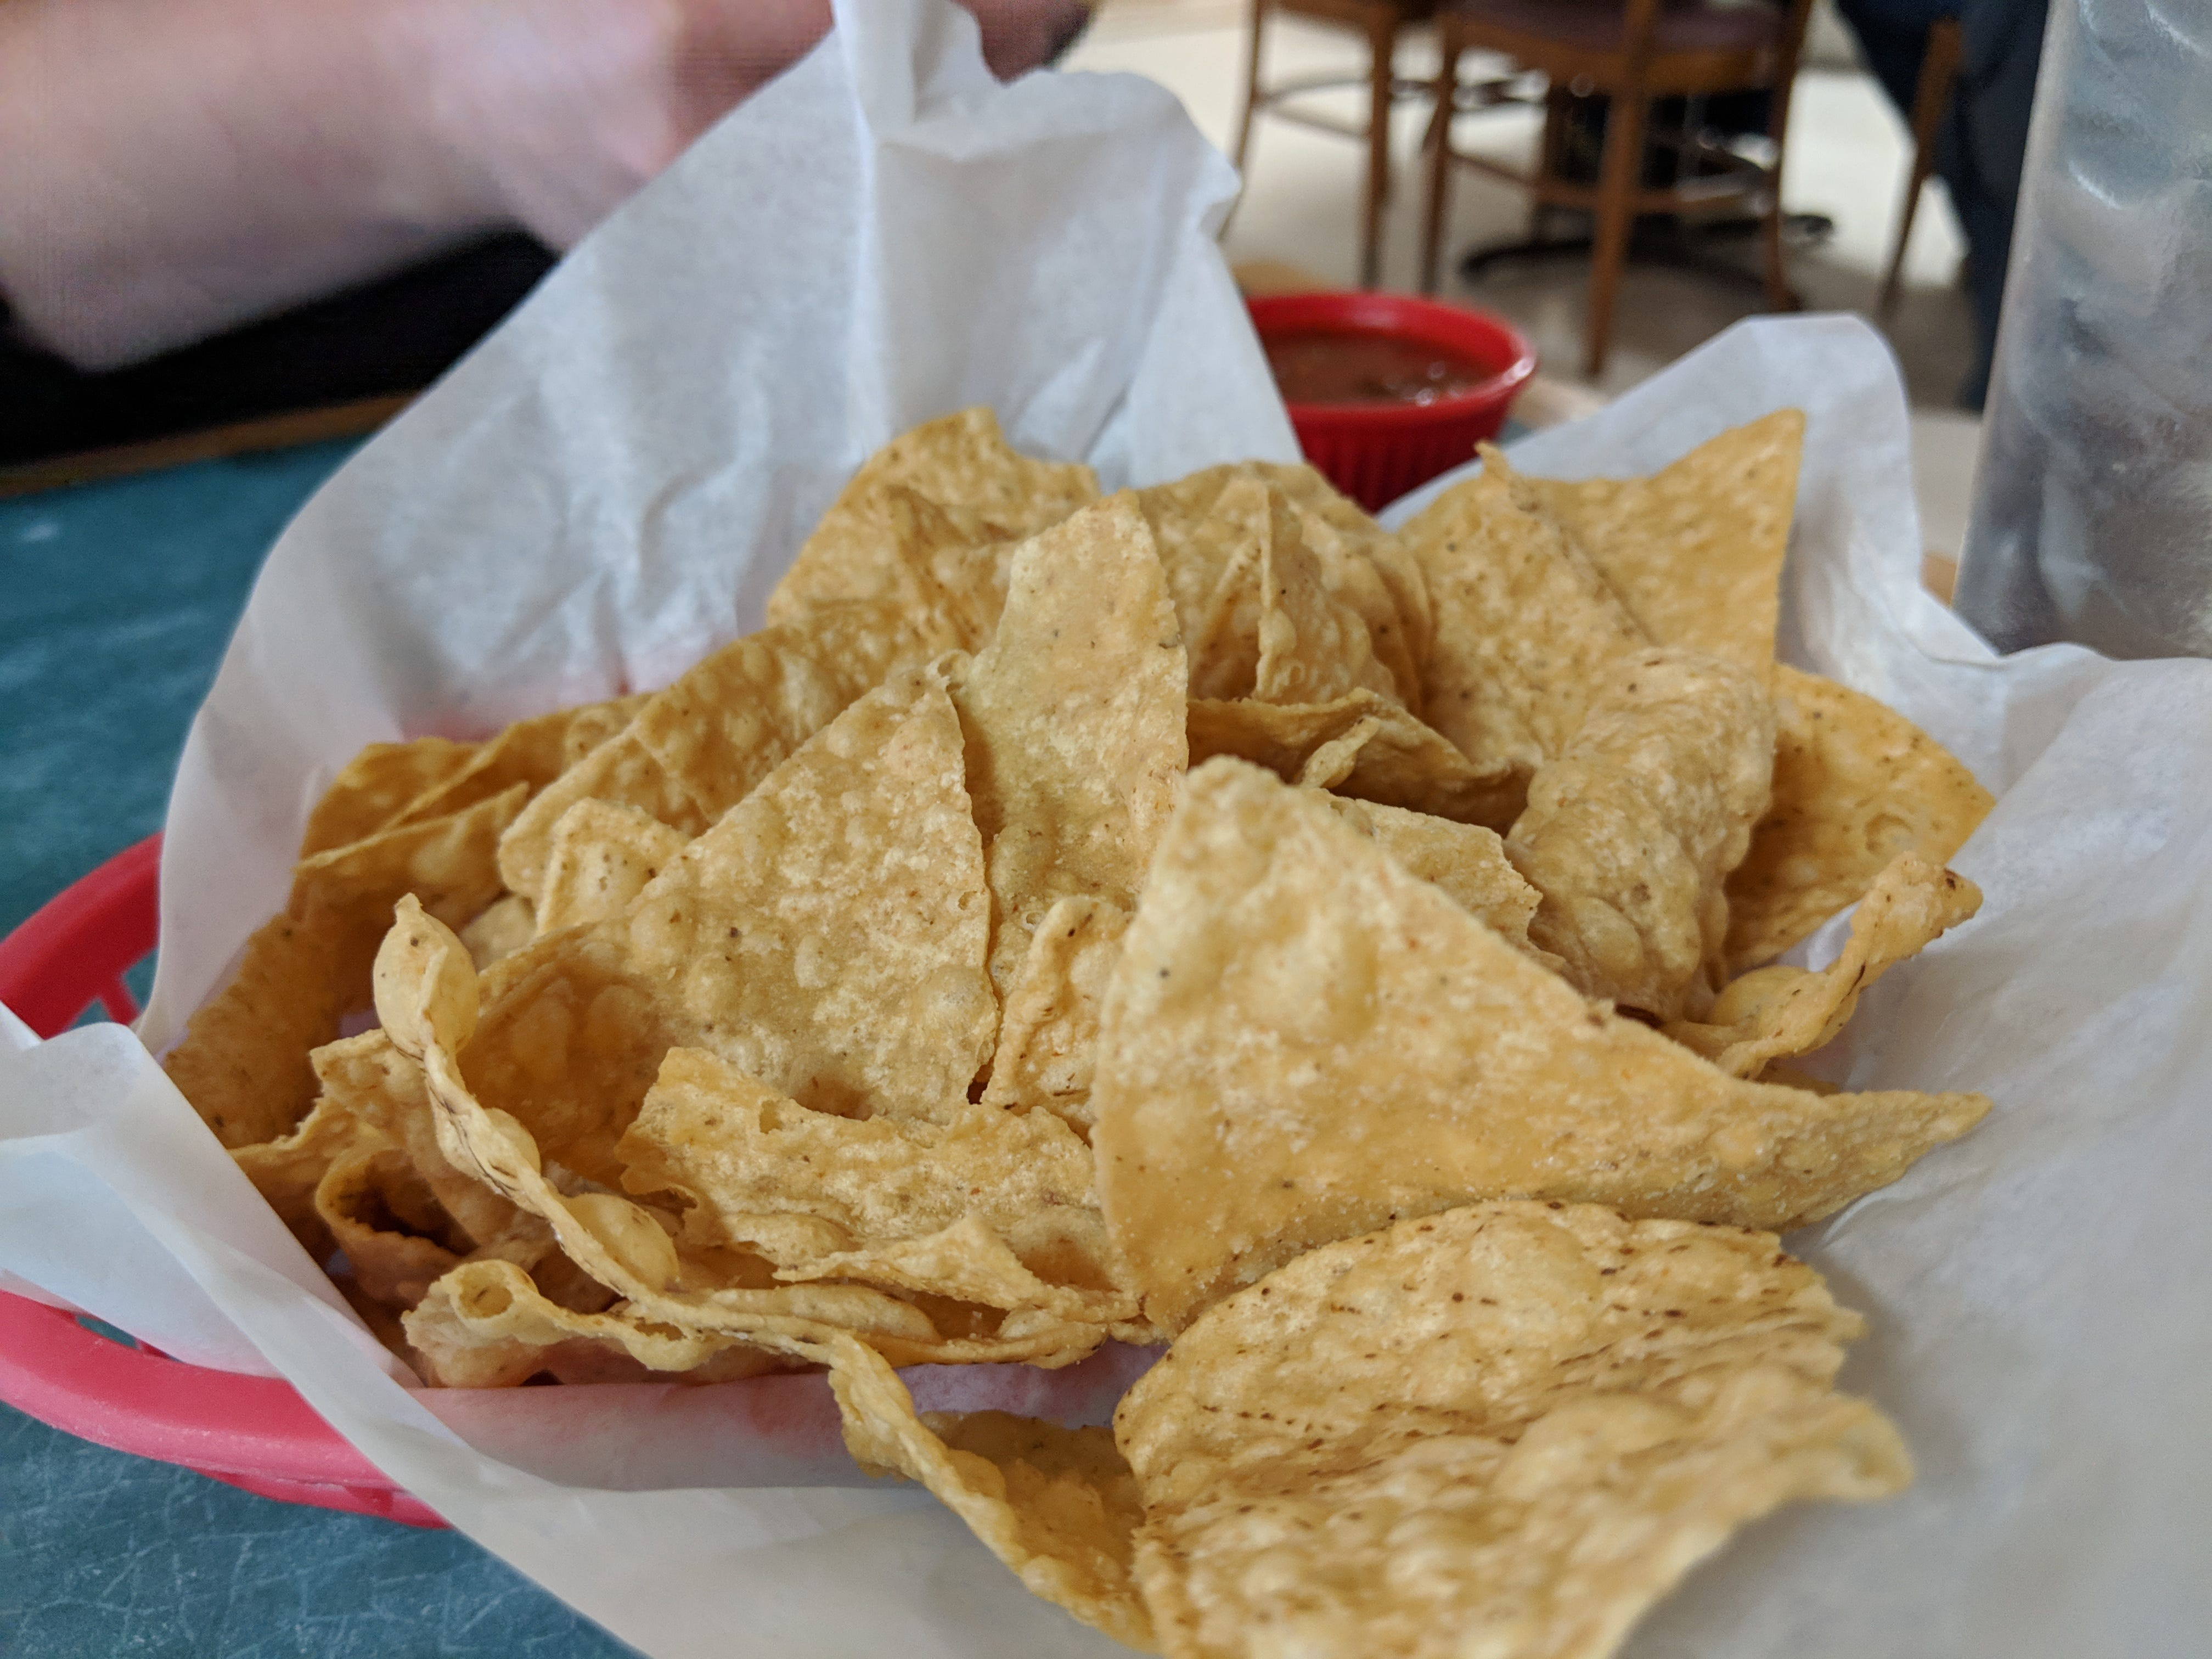 Tortilla chips at Thad & Paisley's Family Resturant.